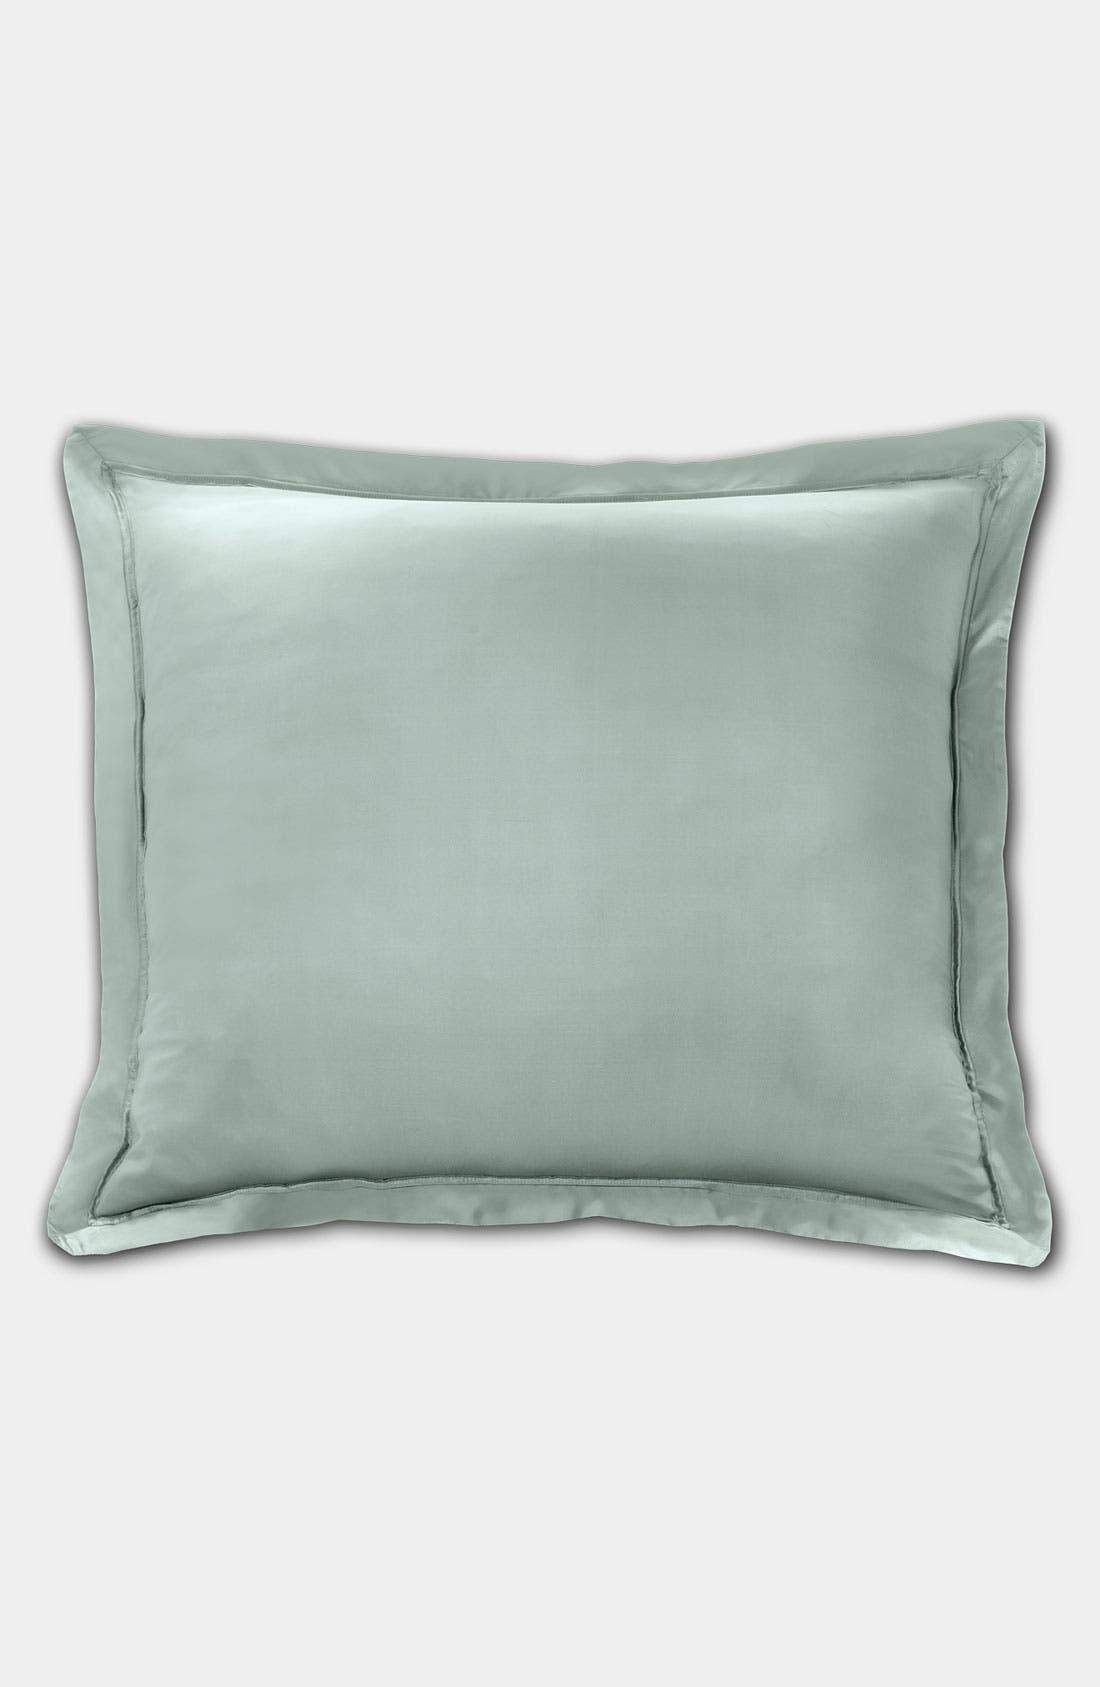 Alternate Image 1 Selected - Donna Karan 'Lustre Seam' Euro Pillow Sham